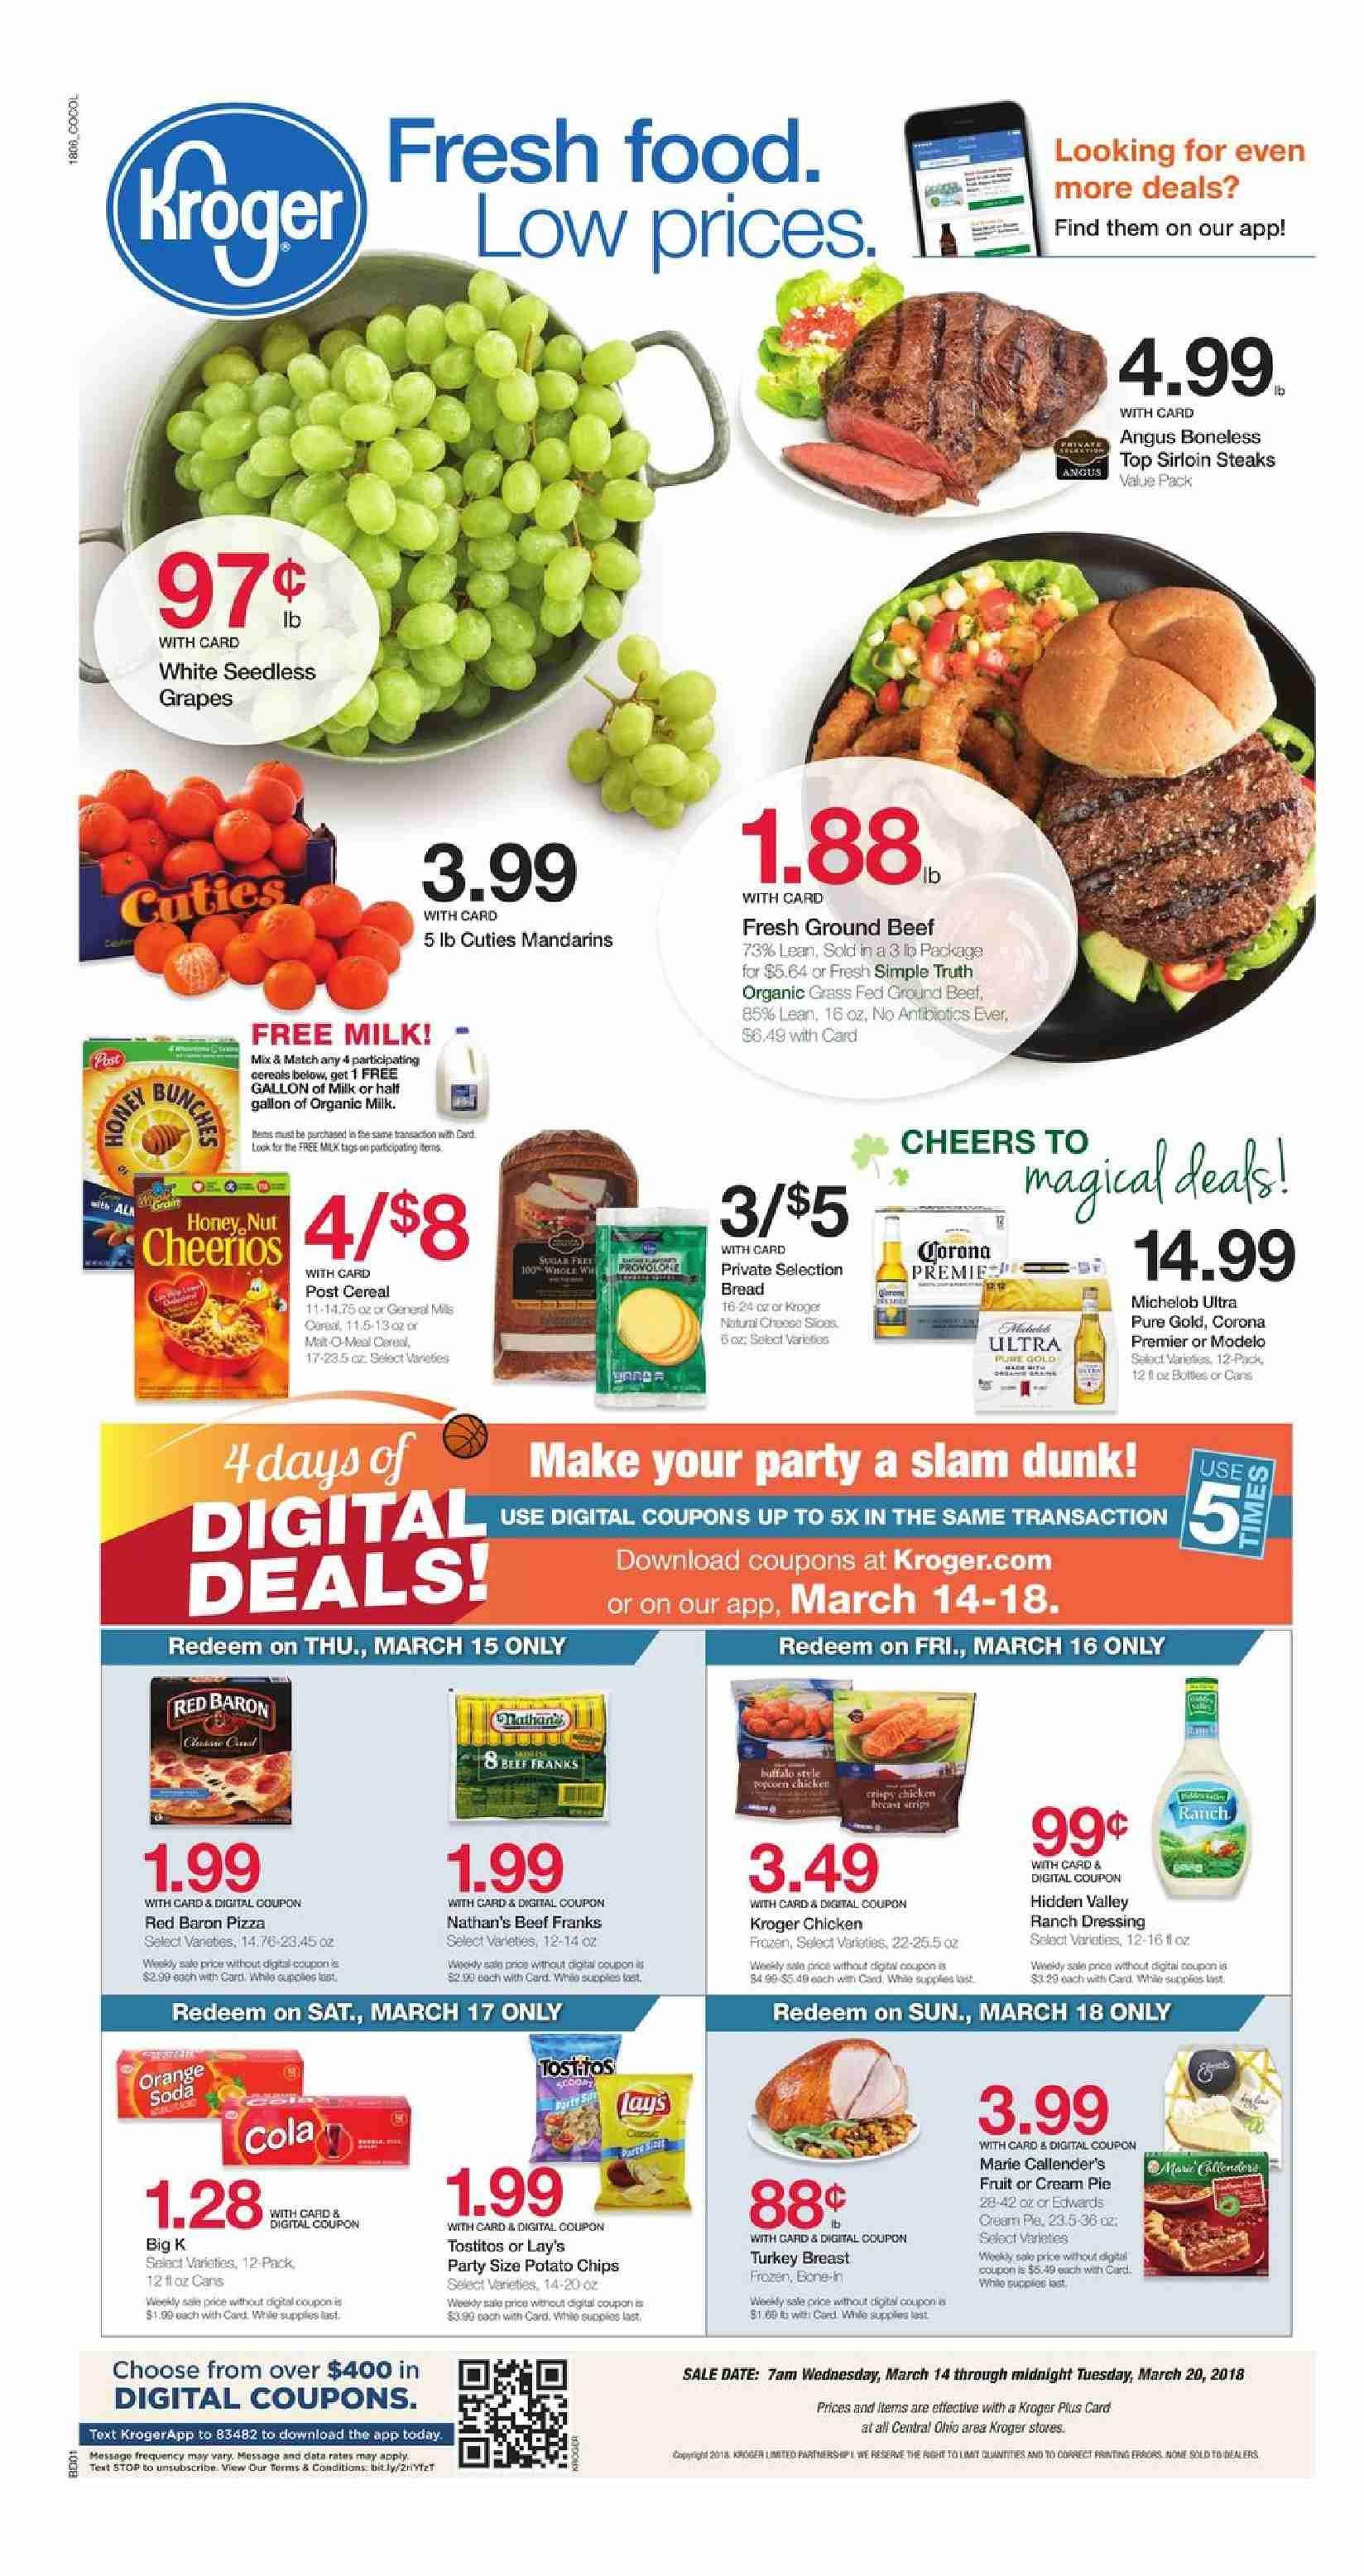 Kroger Weekly Ad Flyer March 11 17 2020 Weeklyad123 Com Kroger Weekly Ads Fresh Food